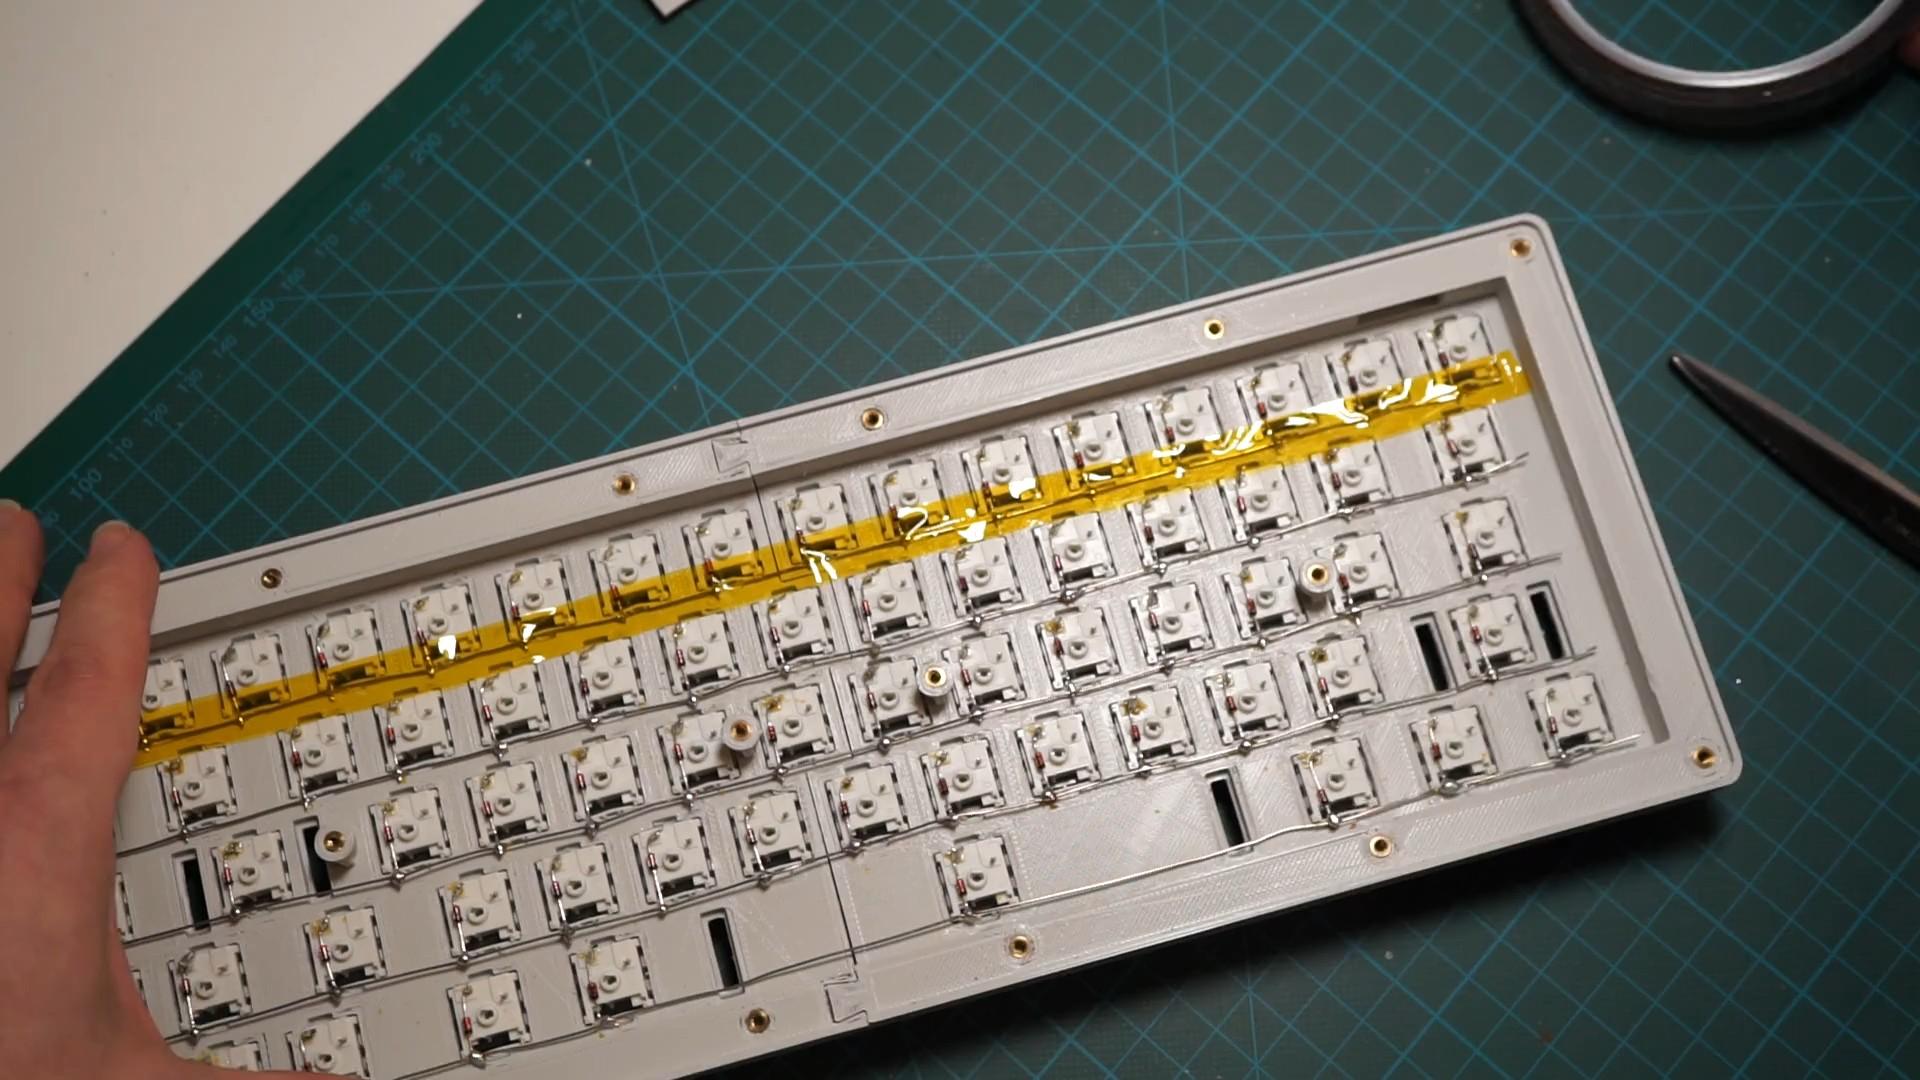 Hand-wiring a custom keyboard